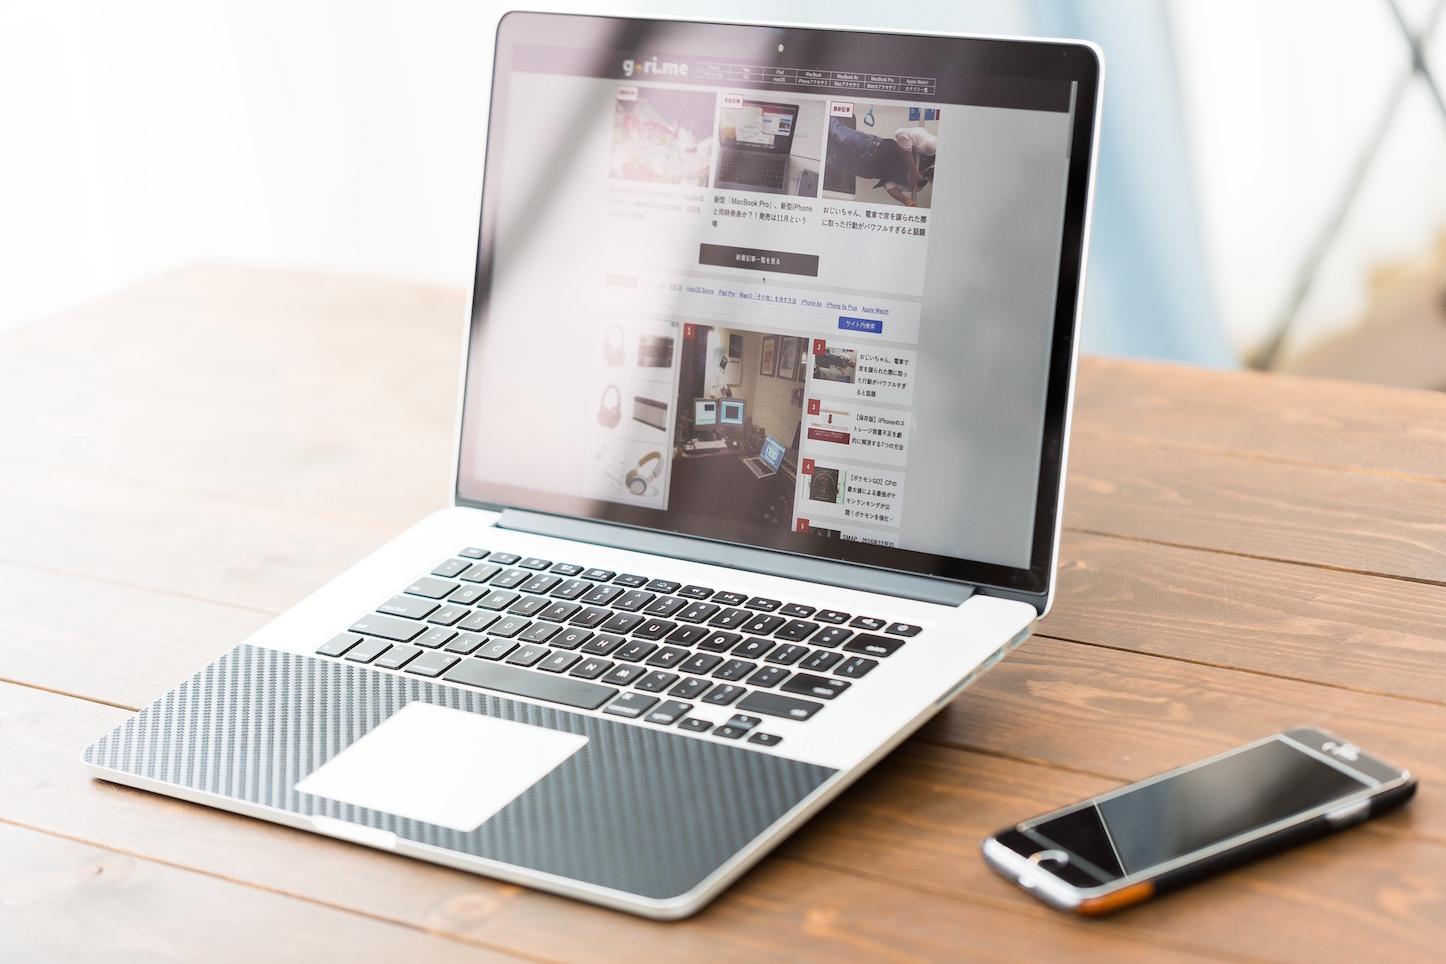 Macbook pro and iphone 6s plus